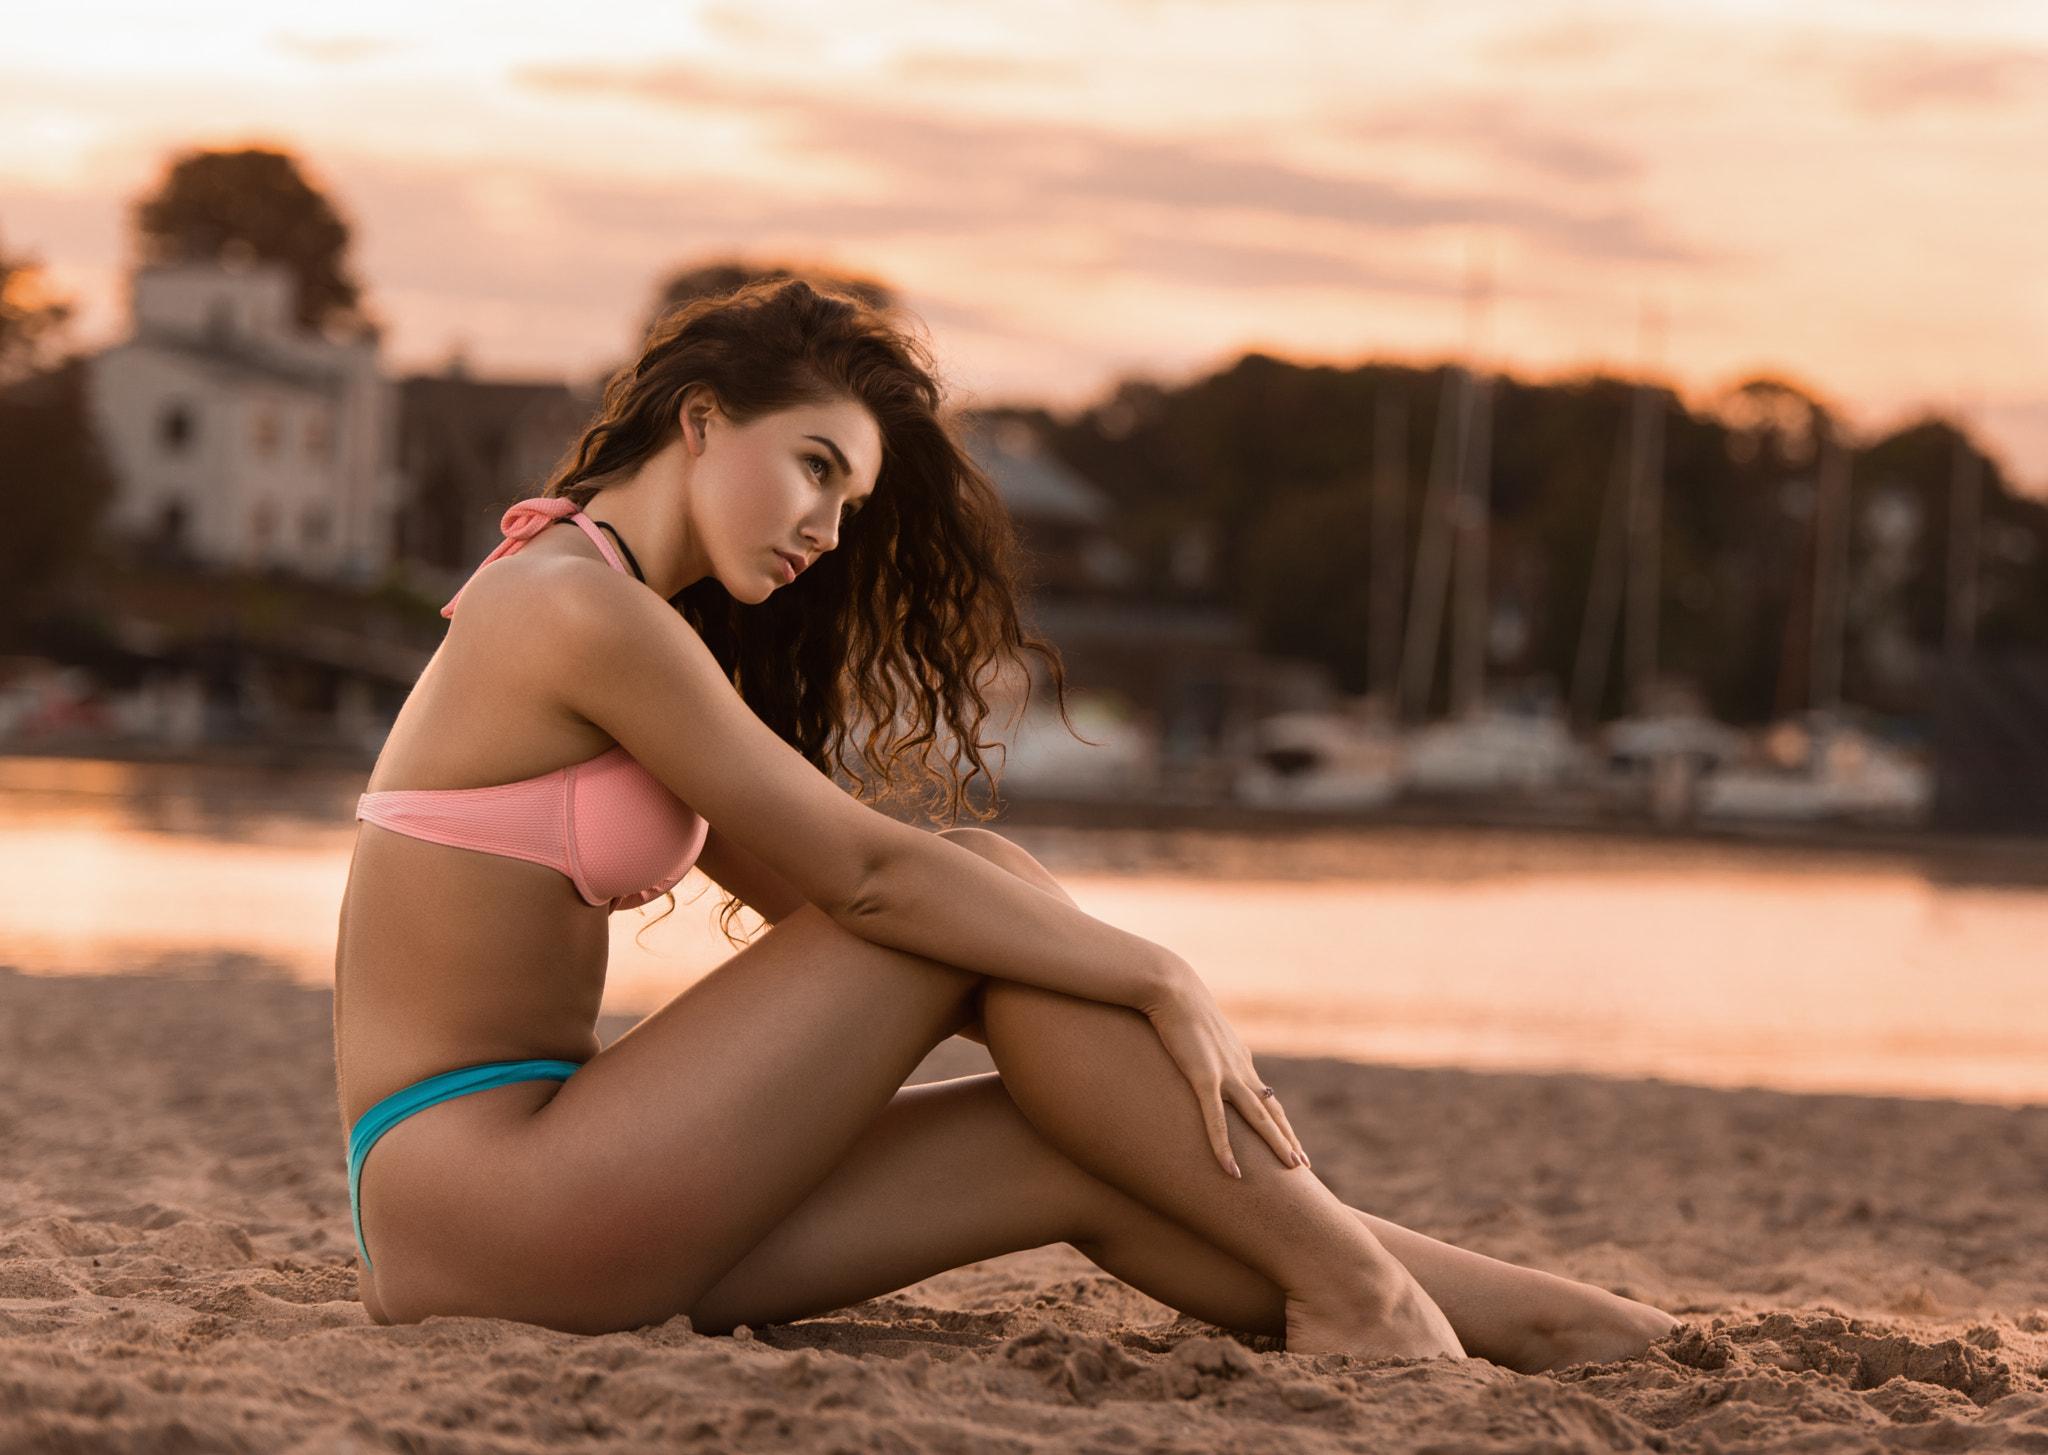 bikini-girls-at-lambeau-field-fuck-the-girl-game